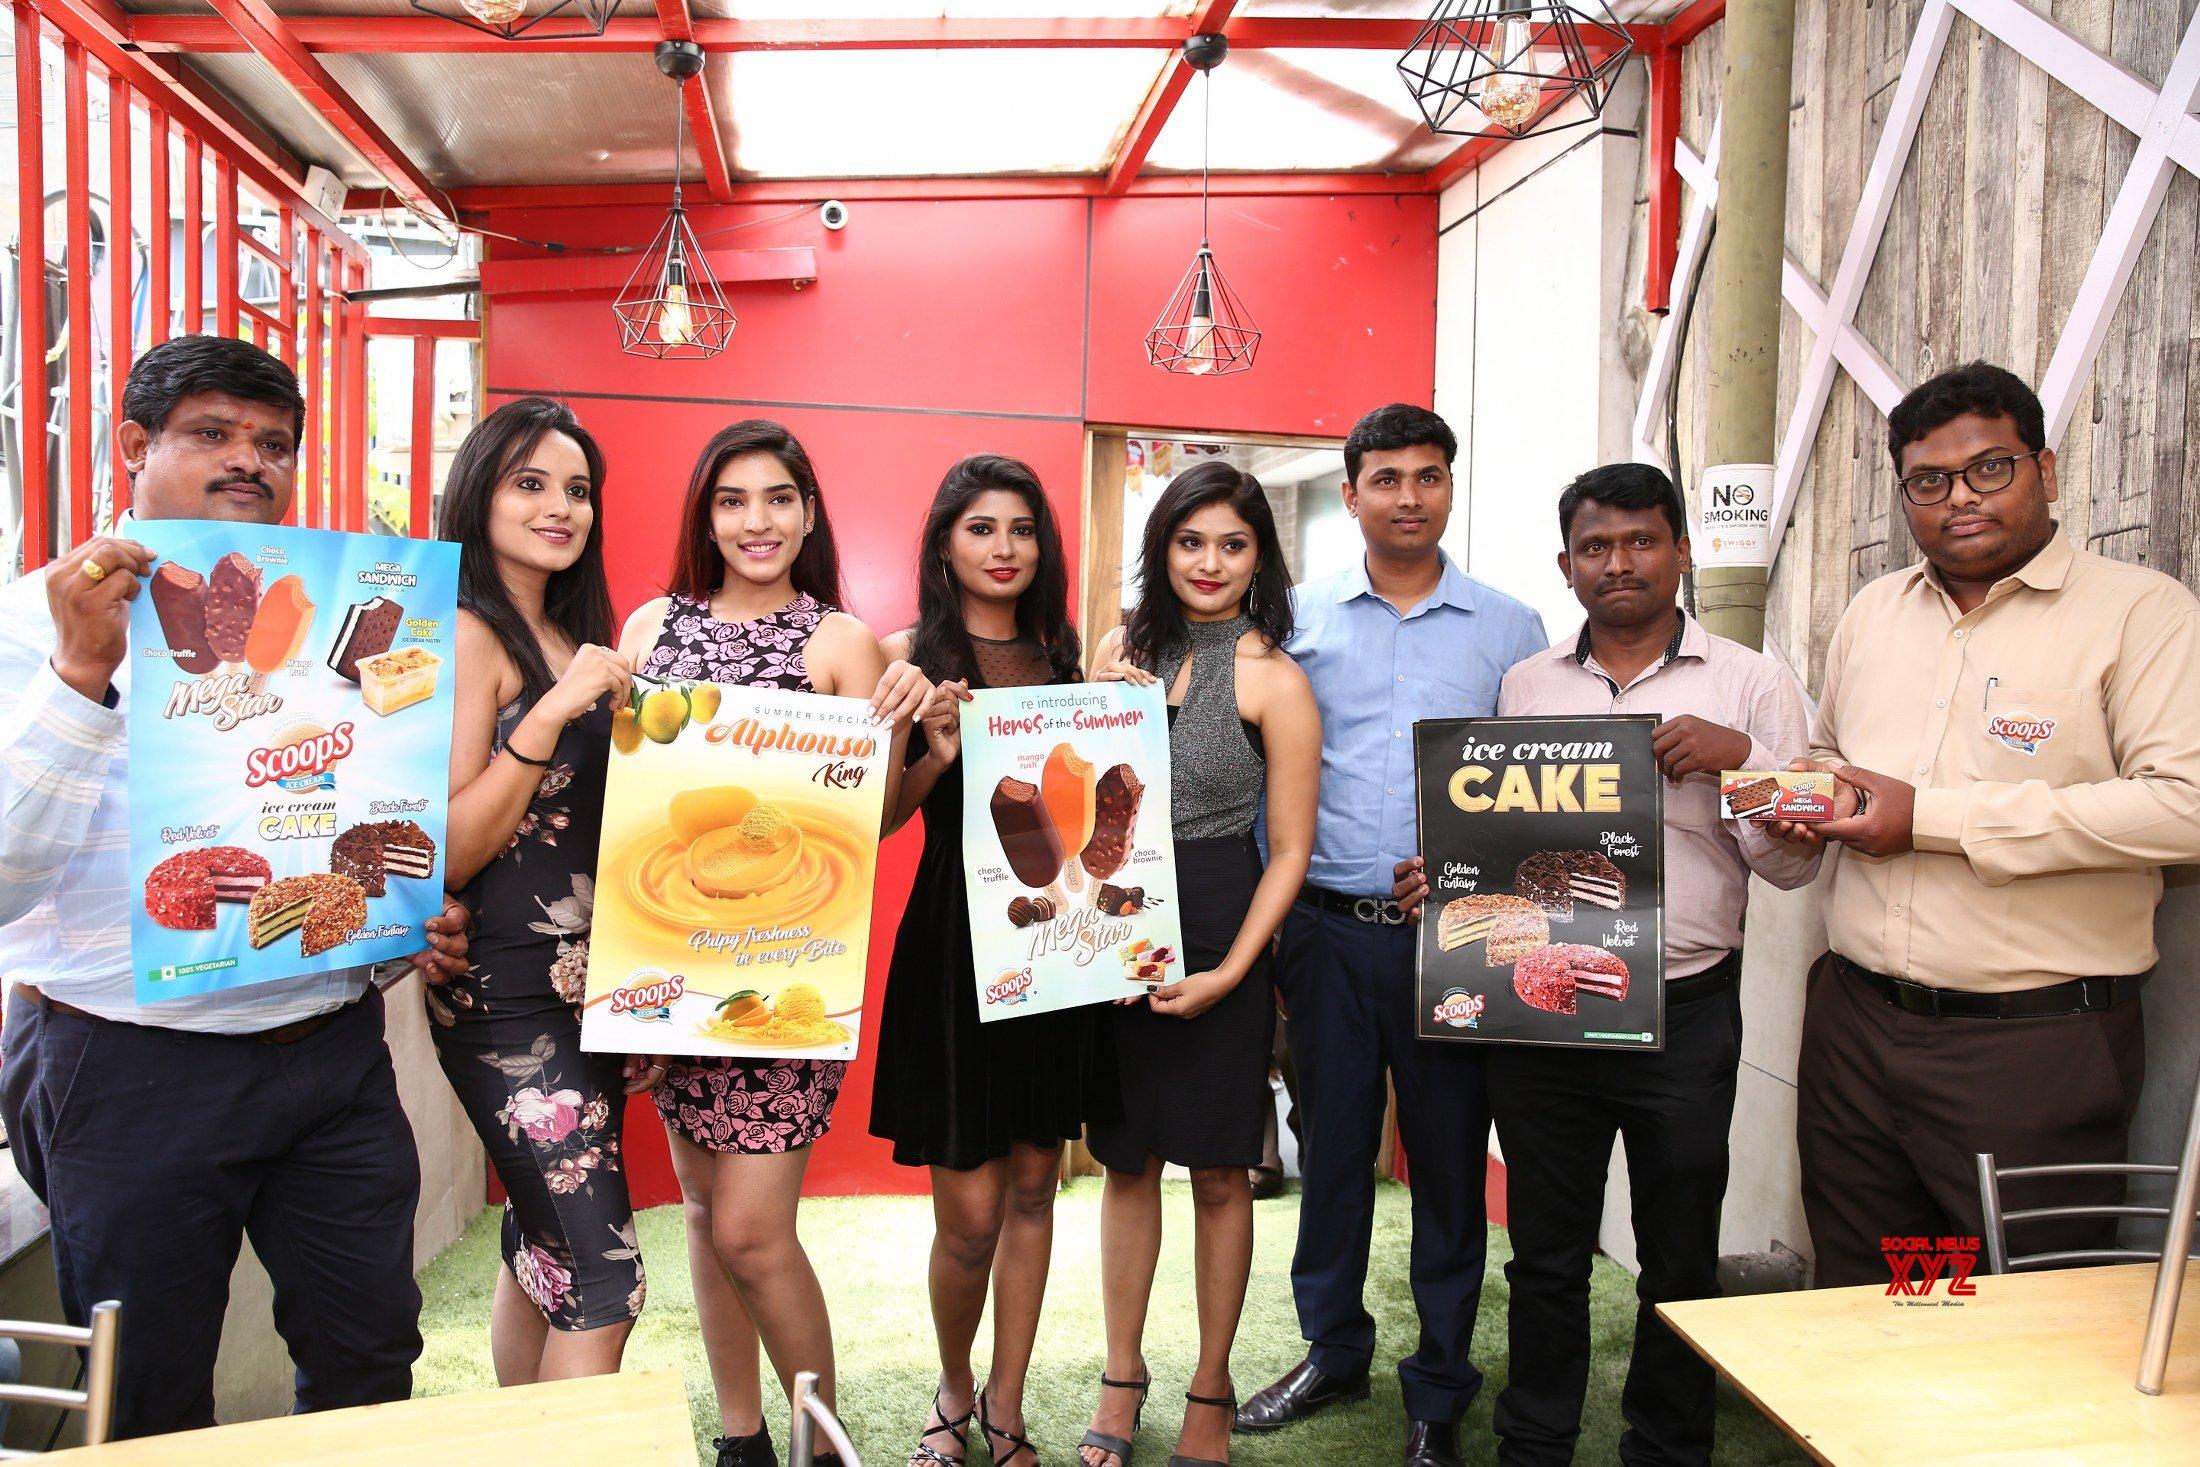 Actress Sanjana Introduced Scoops Summer Flavors